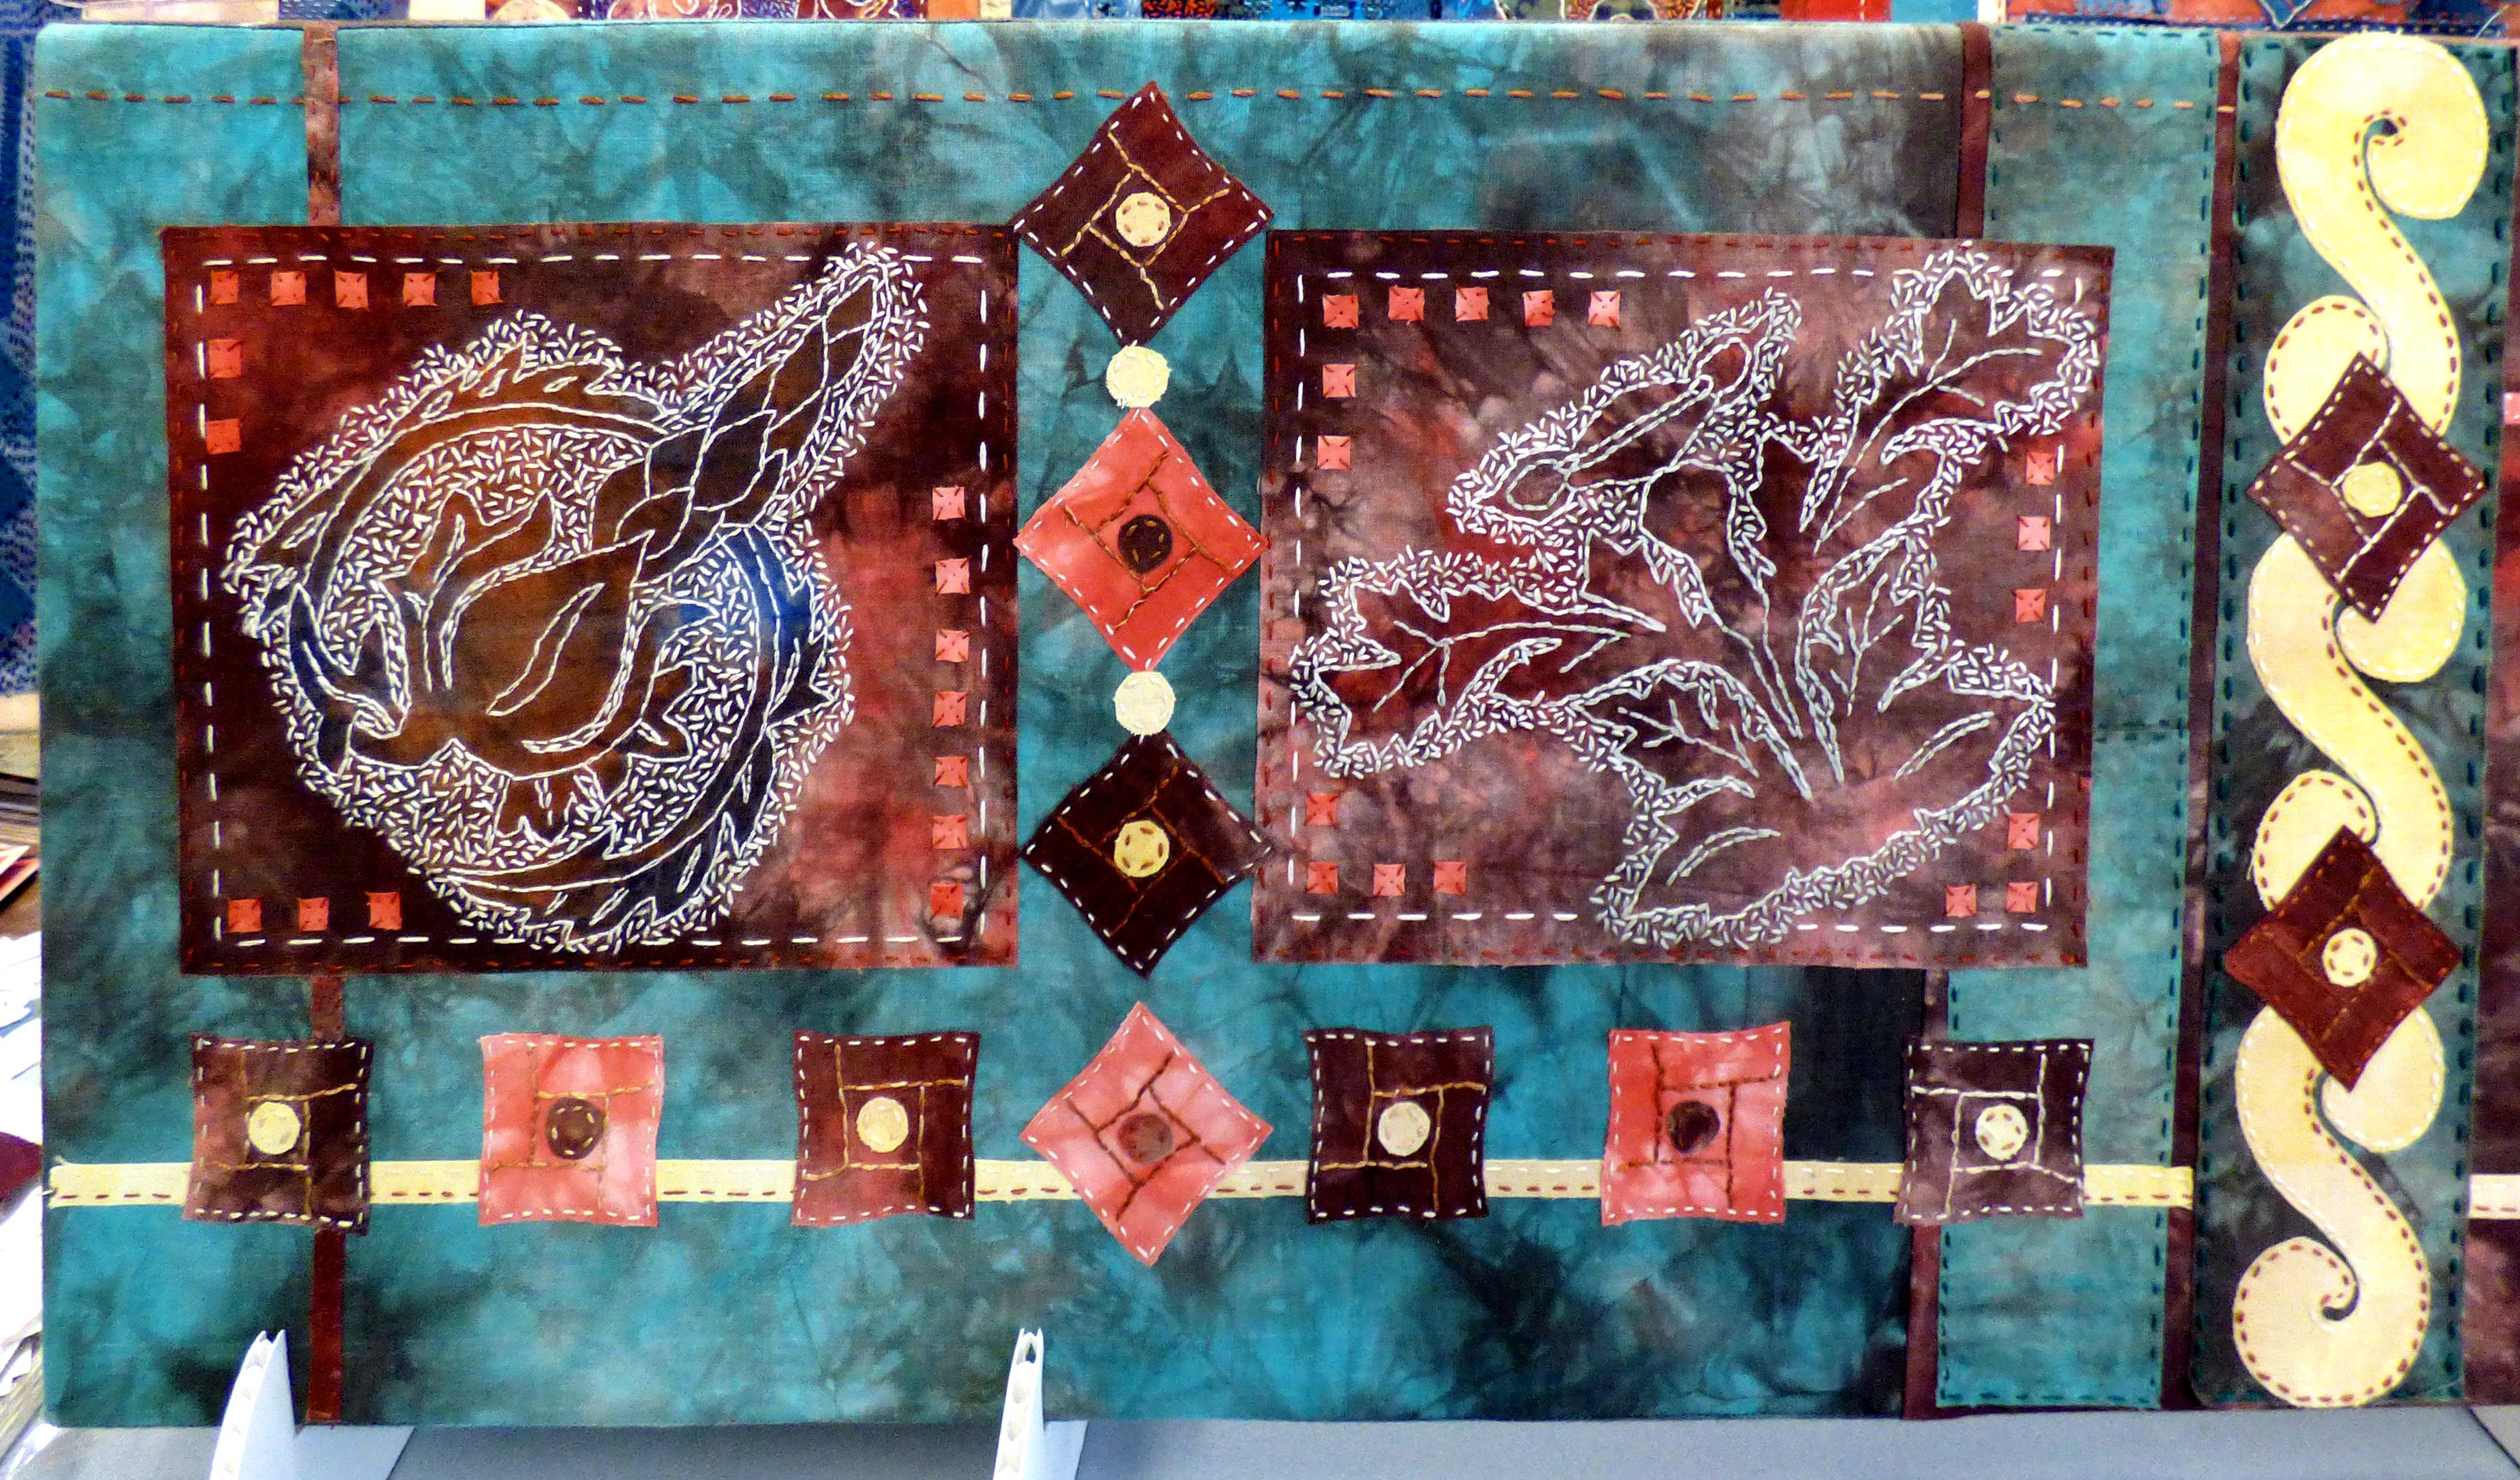 embroidery by Barbara Ryall, Bolton EG 2018